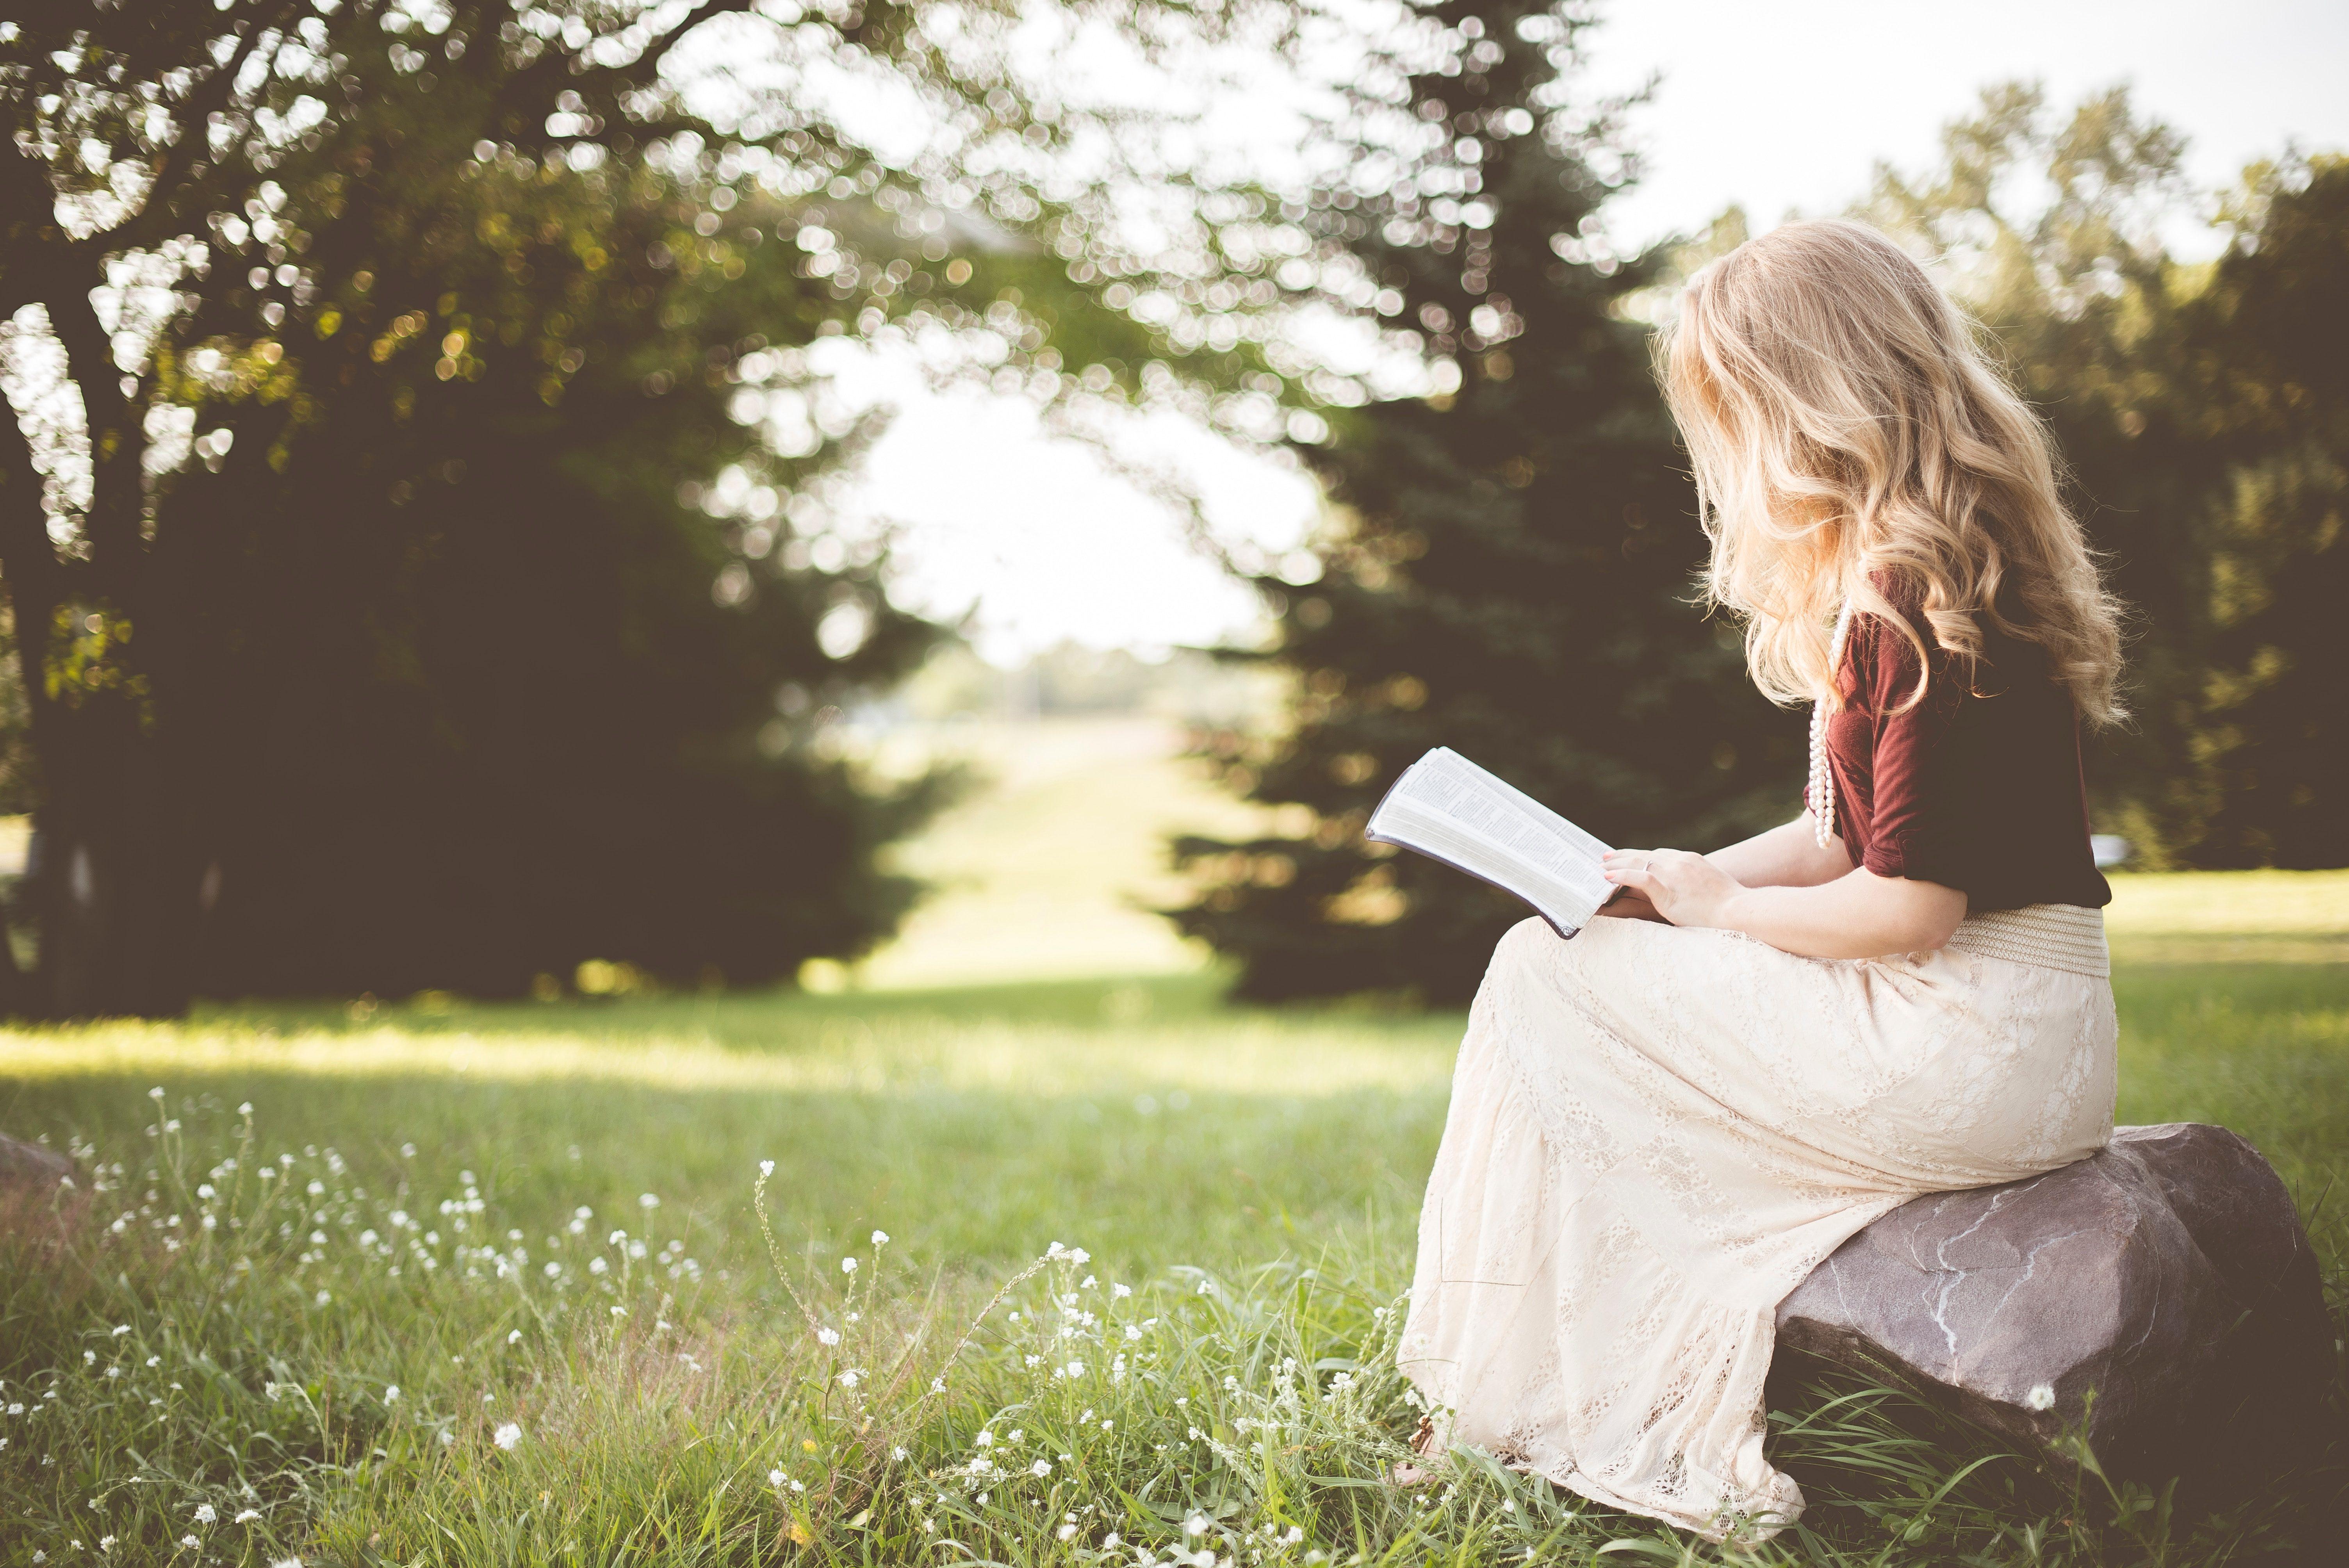 Best Self Help Books for Women new